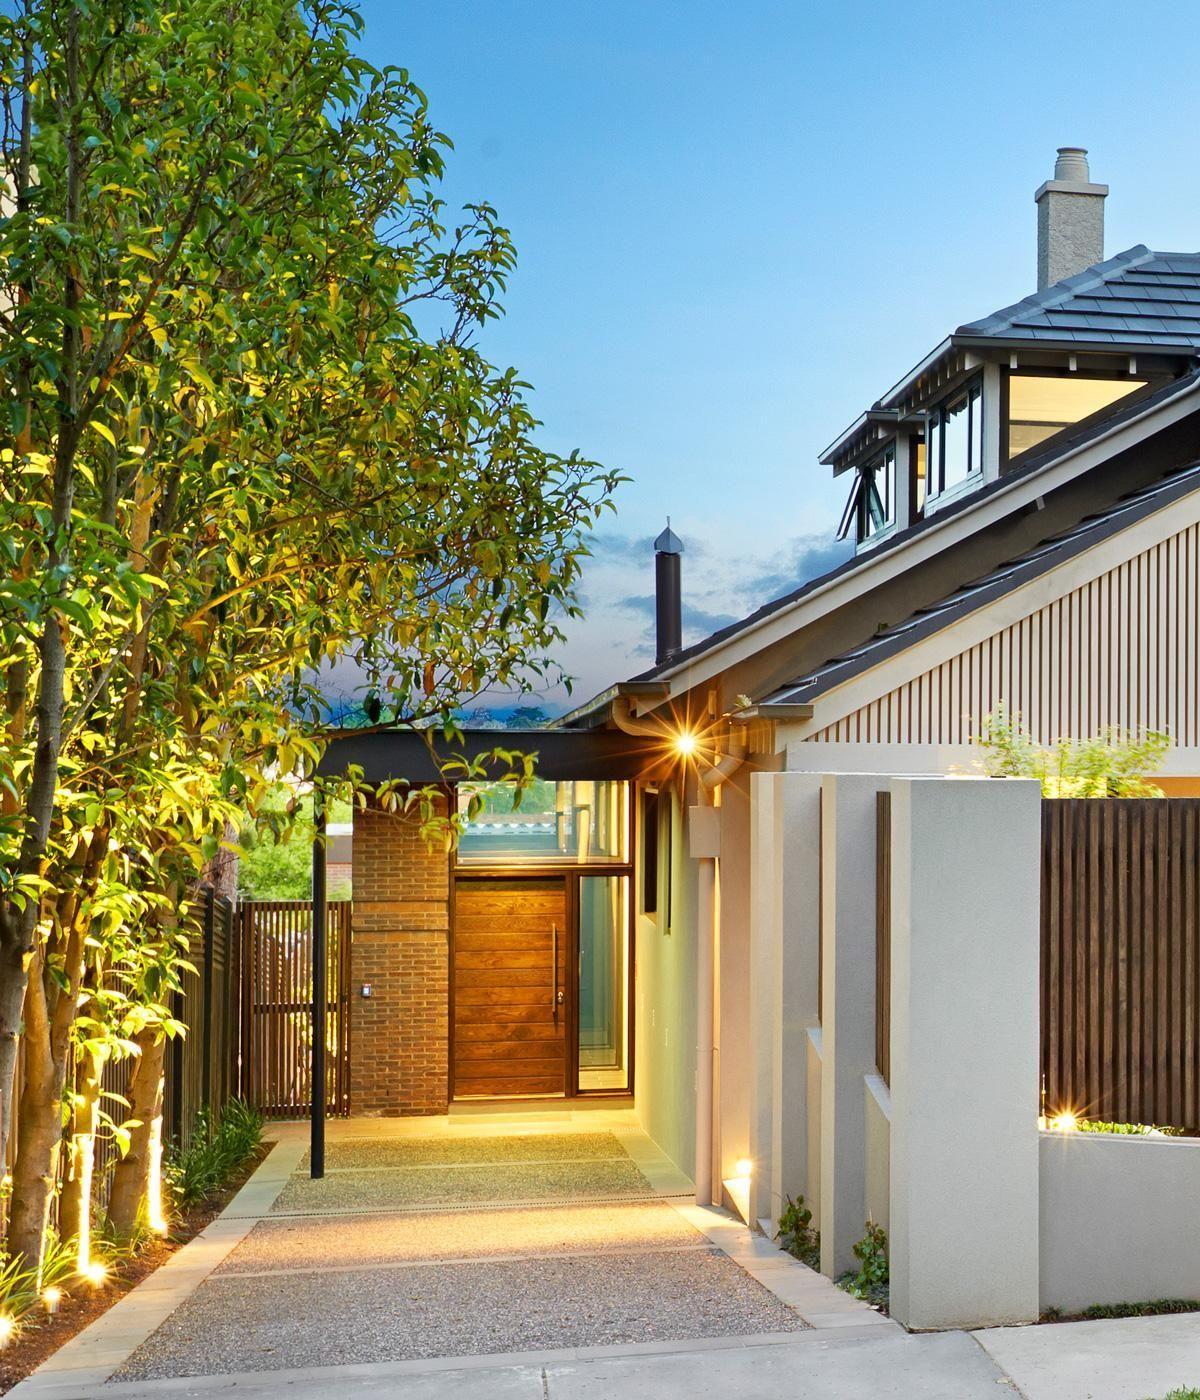 Home Design Ideas Australia: 10 Best Examples Of Modern Architecture In Australia